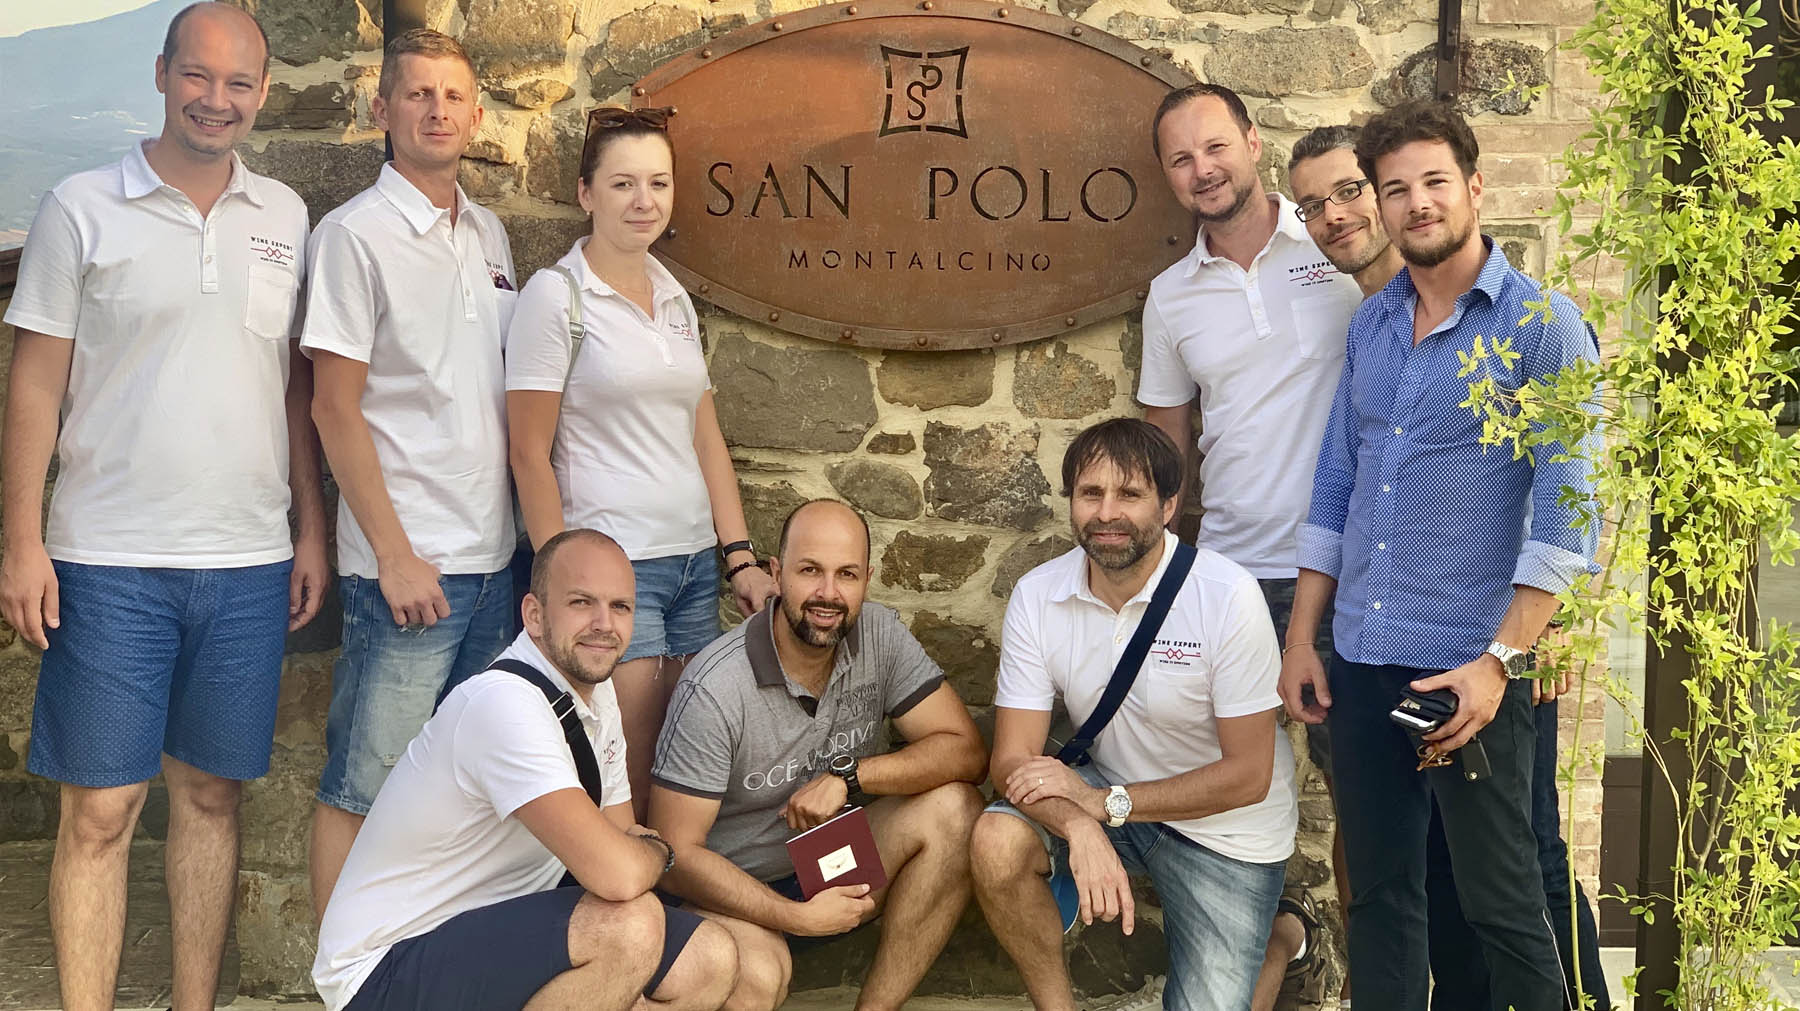 San Polo talianske vinarstvo